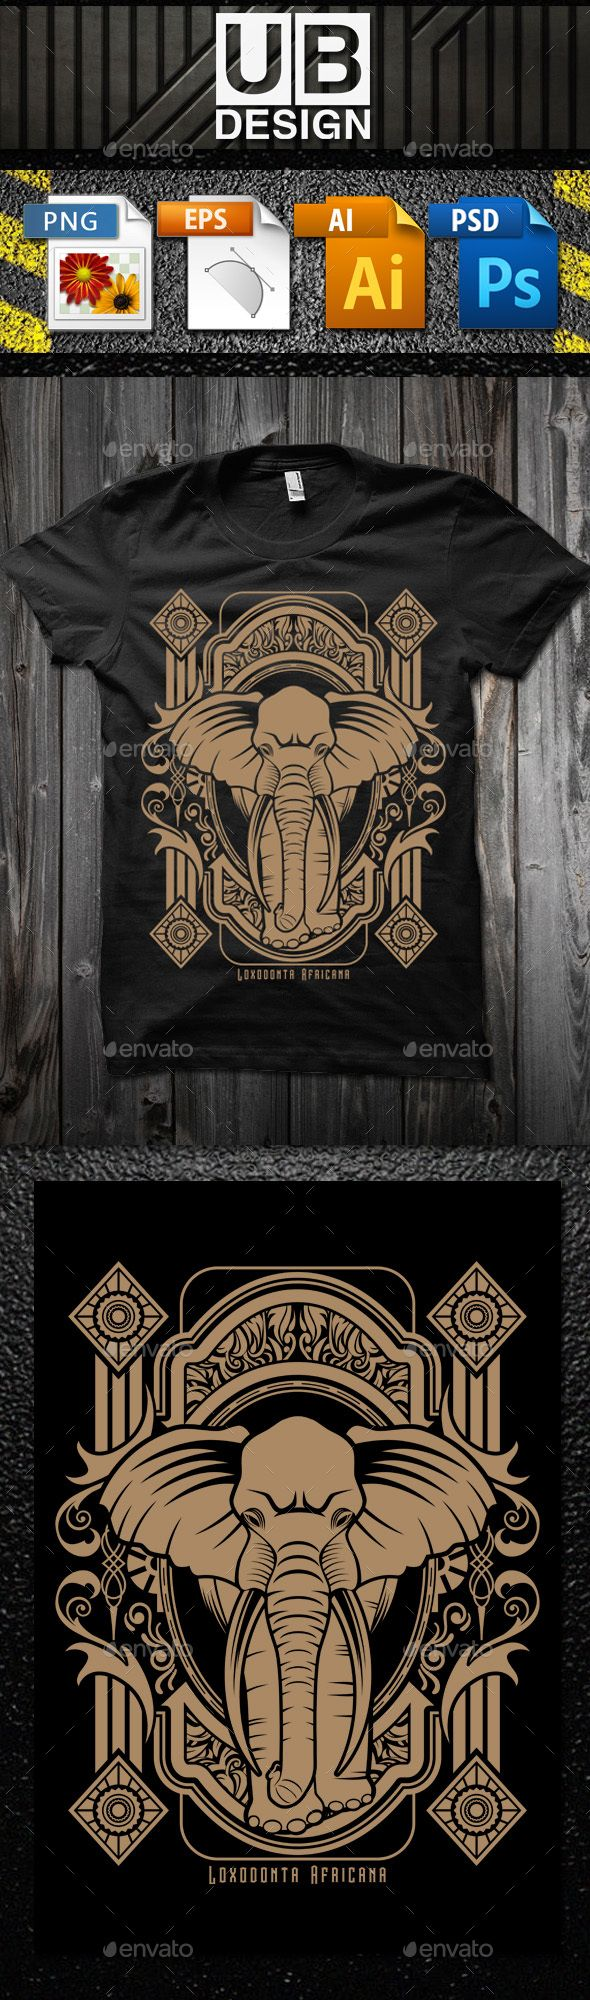 Black t shirt vector ai - Loxodonta Africana T Shirt Vector Illustration Vector Eps Photoshop Psd Transparent Png